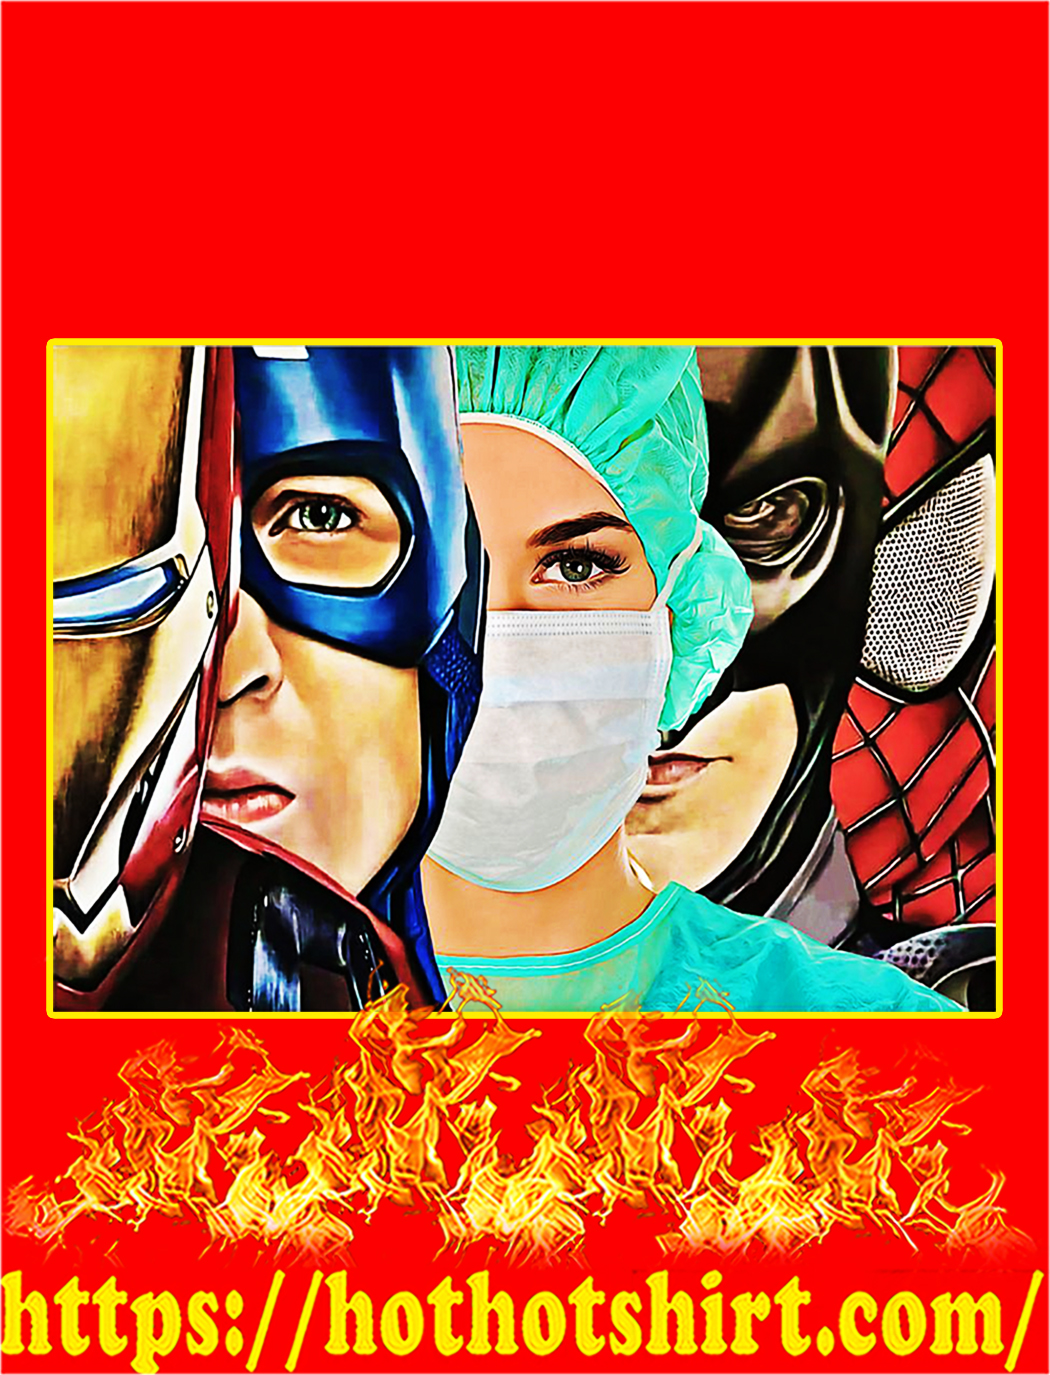 Nurse Superhero Iron Man Poster - A2